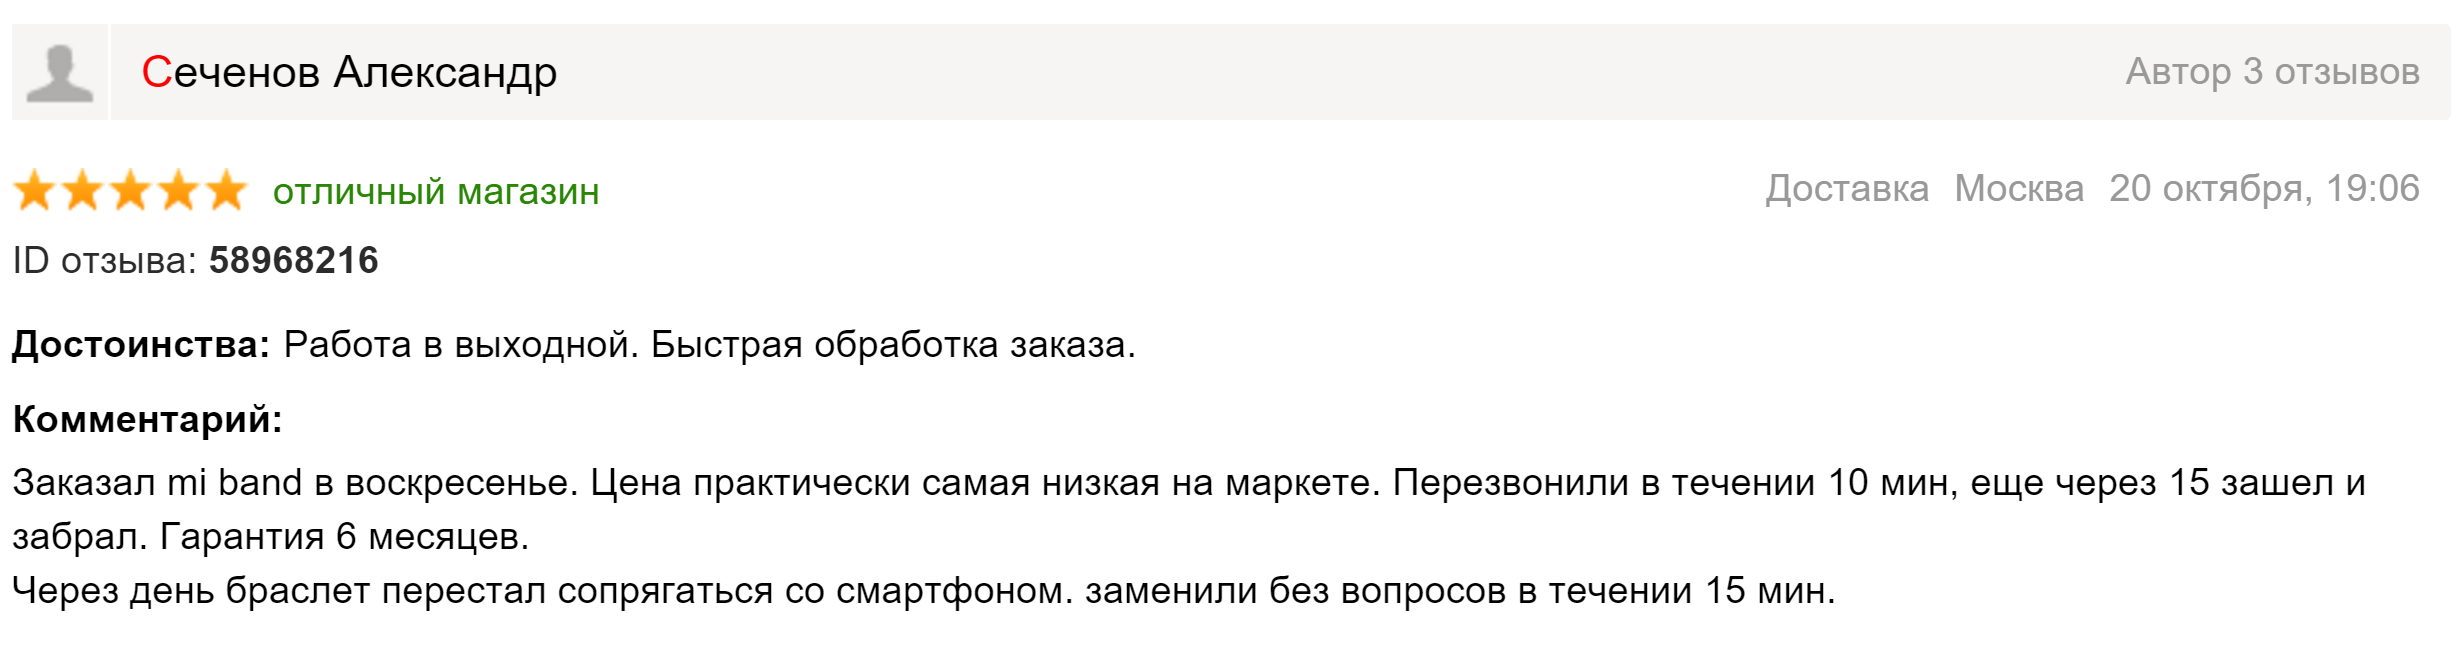 screenshot-29nov2015-01.57.22.png